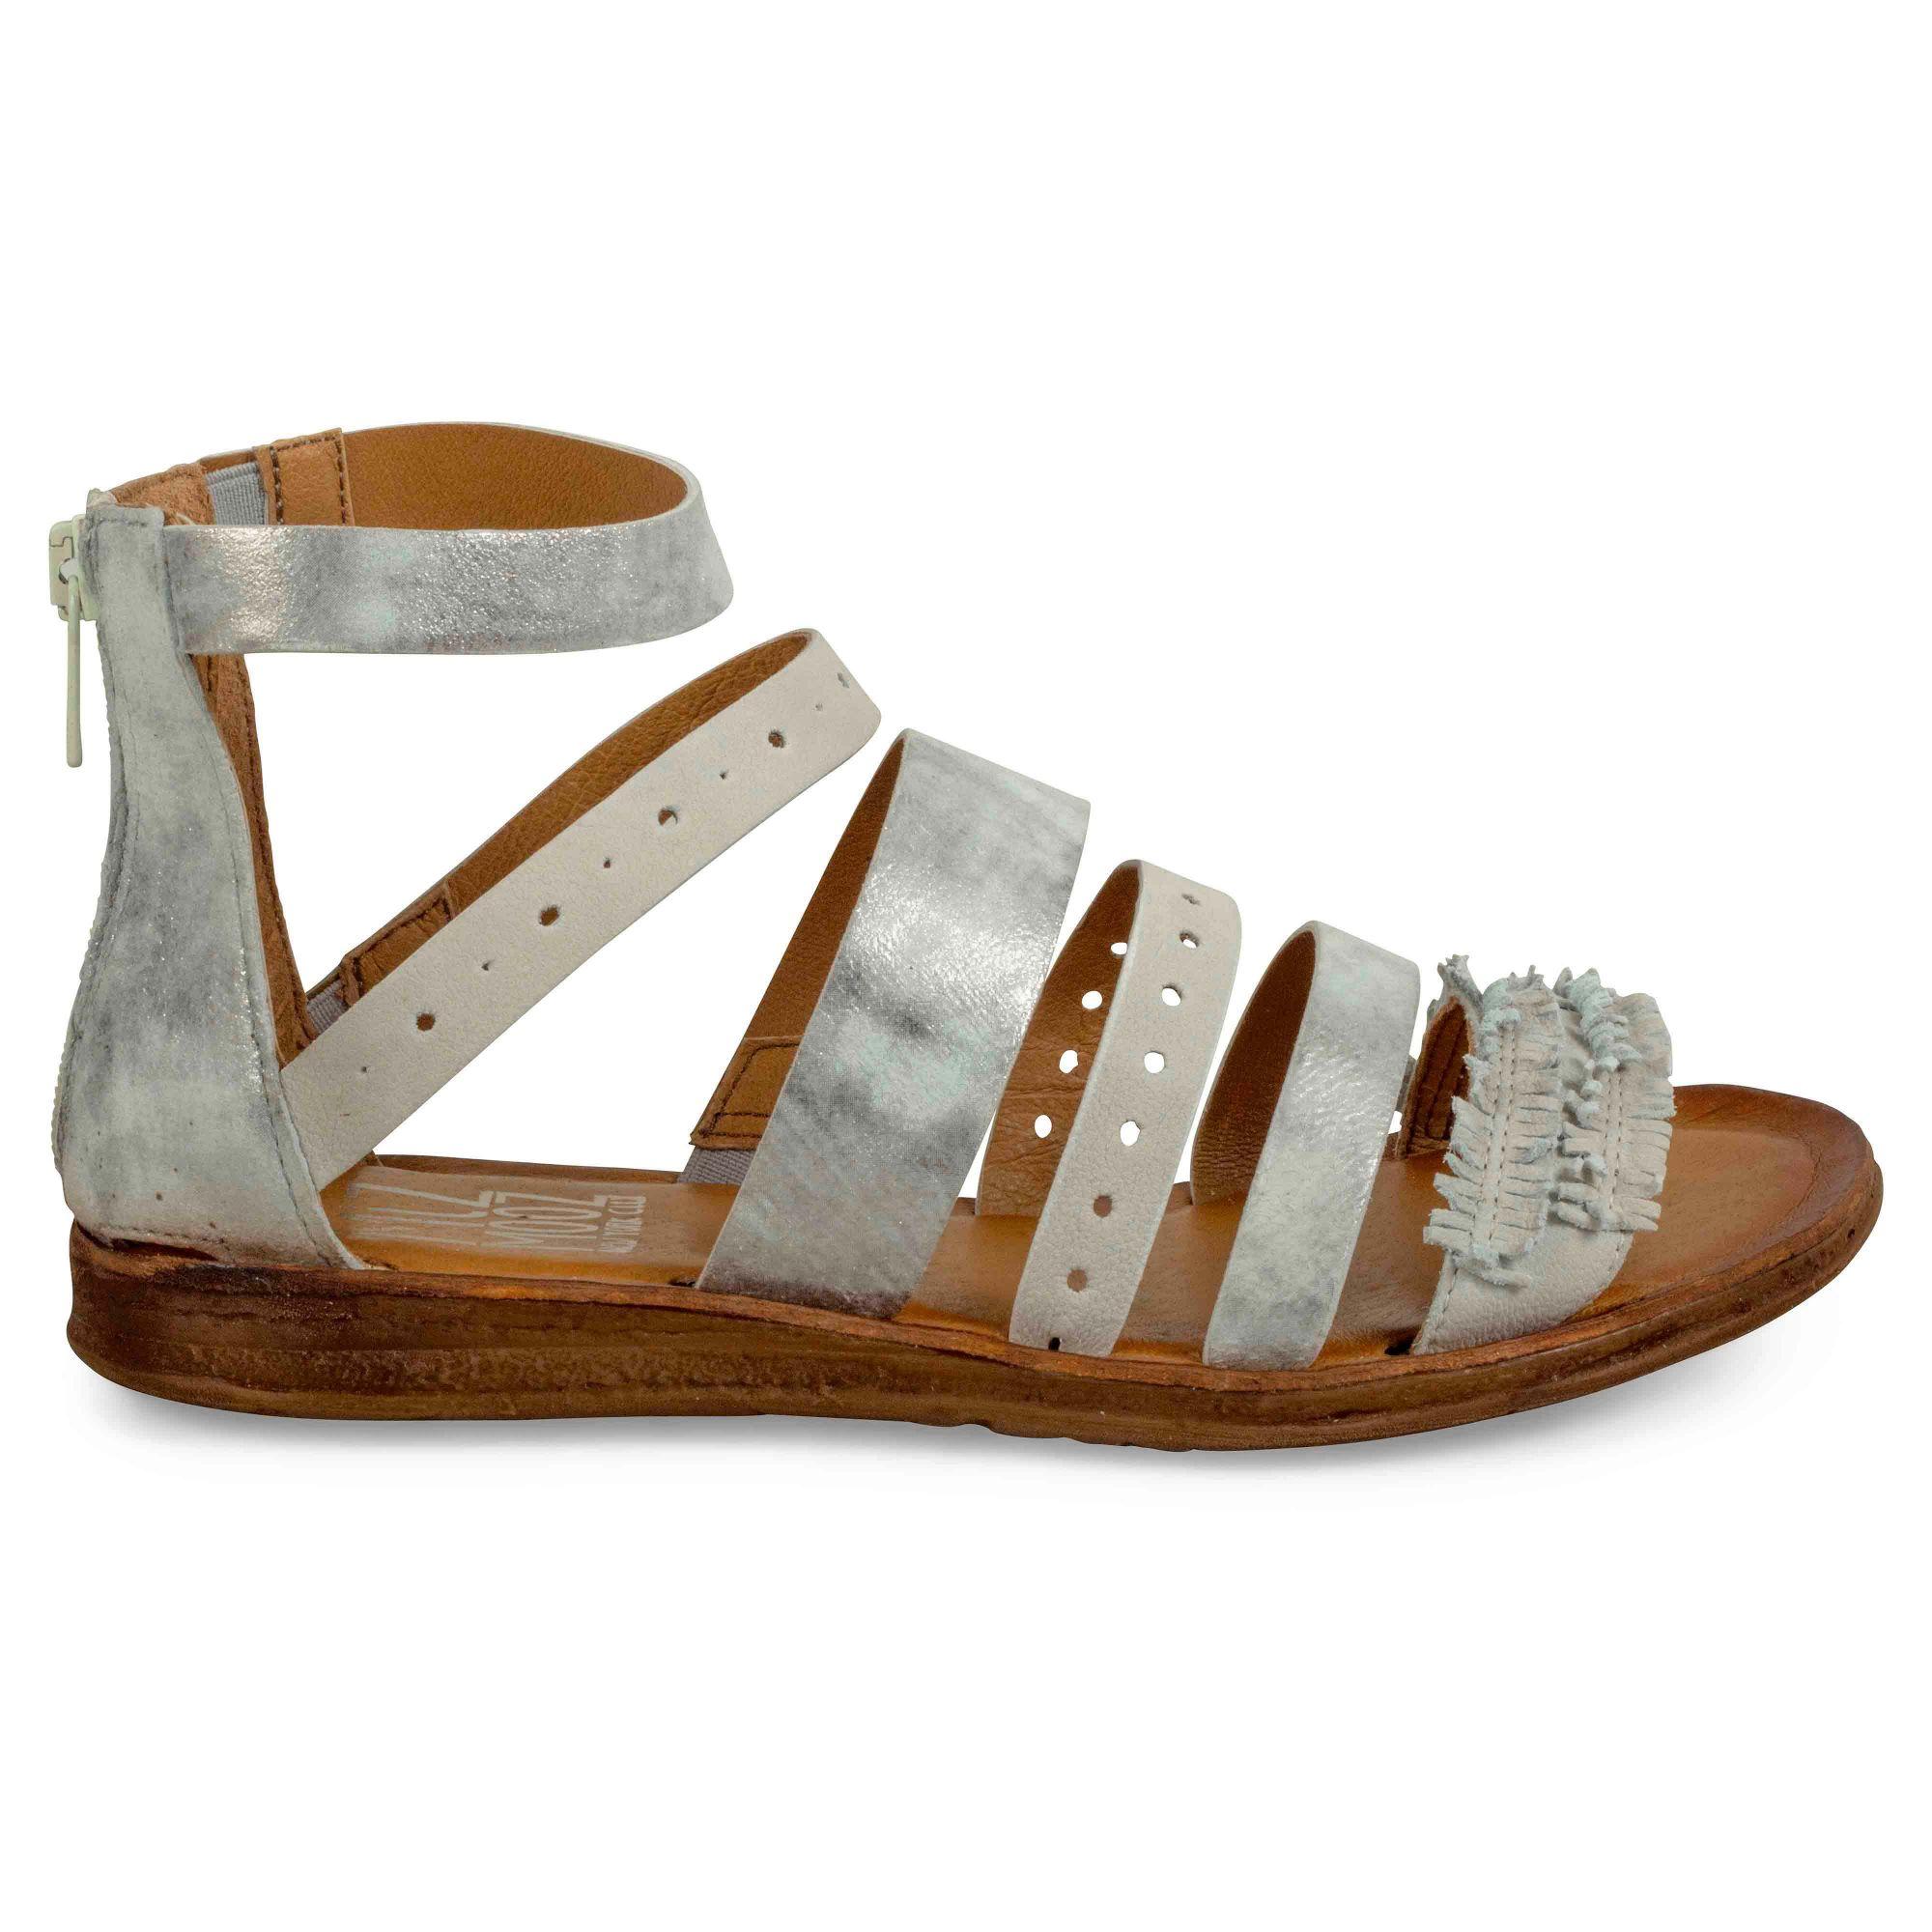 Miz Mooz Flora - Final Sale Sandals